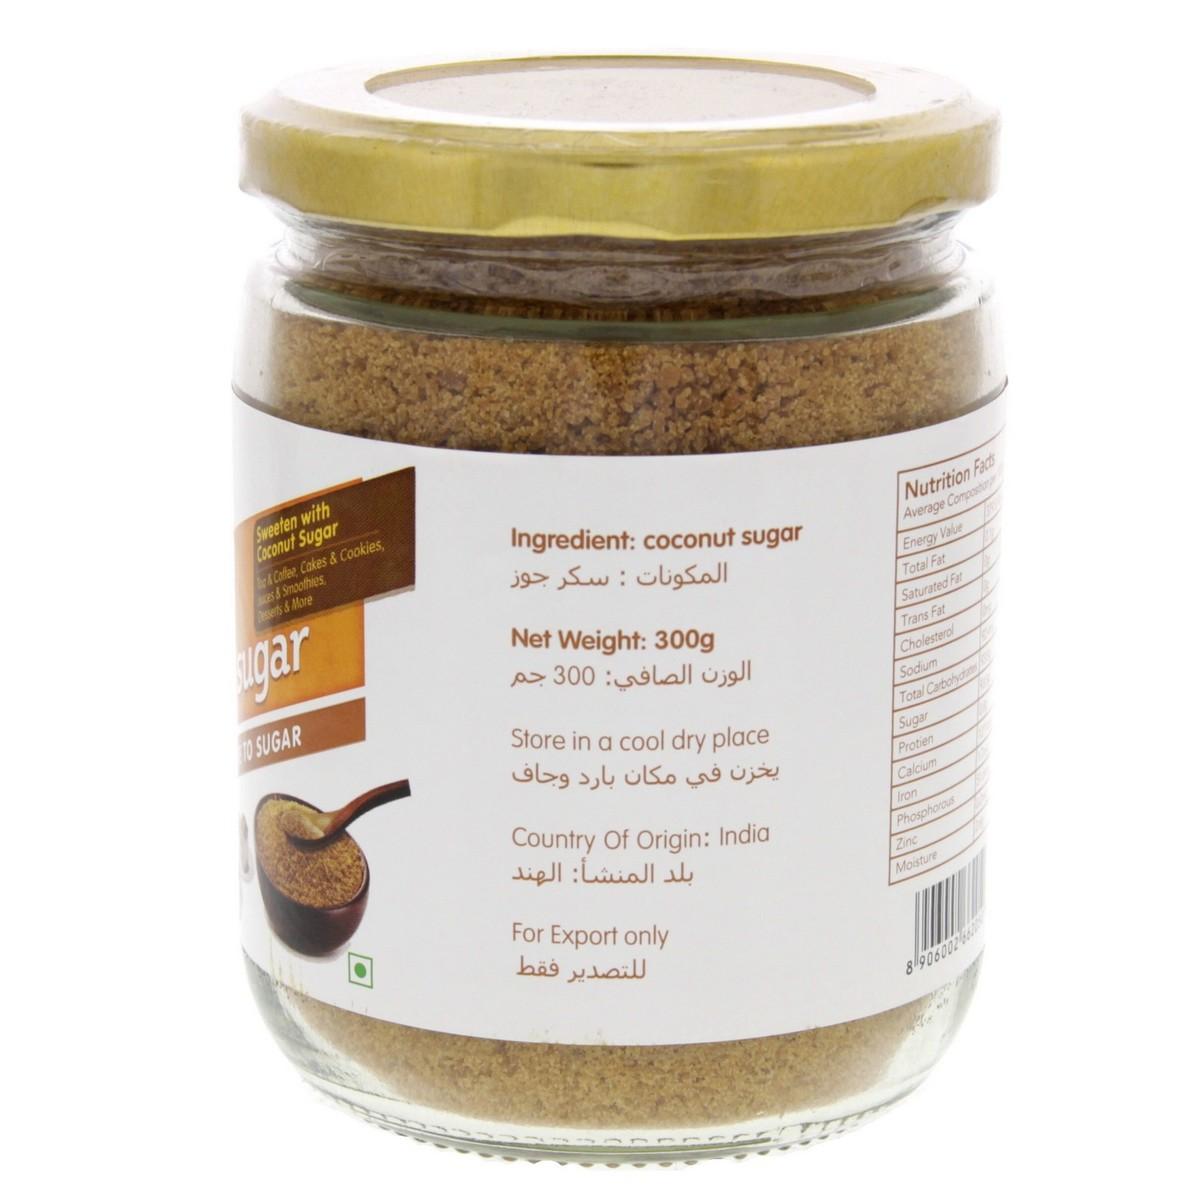 Buy KLF Coconad Natural Coconut Sugar 300 Gm - Others - Lulu